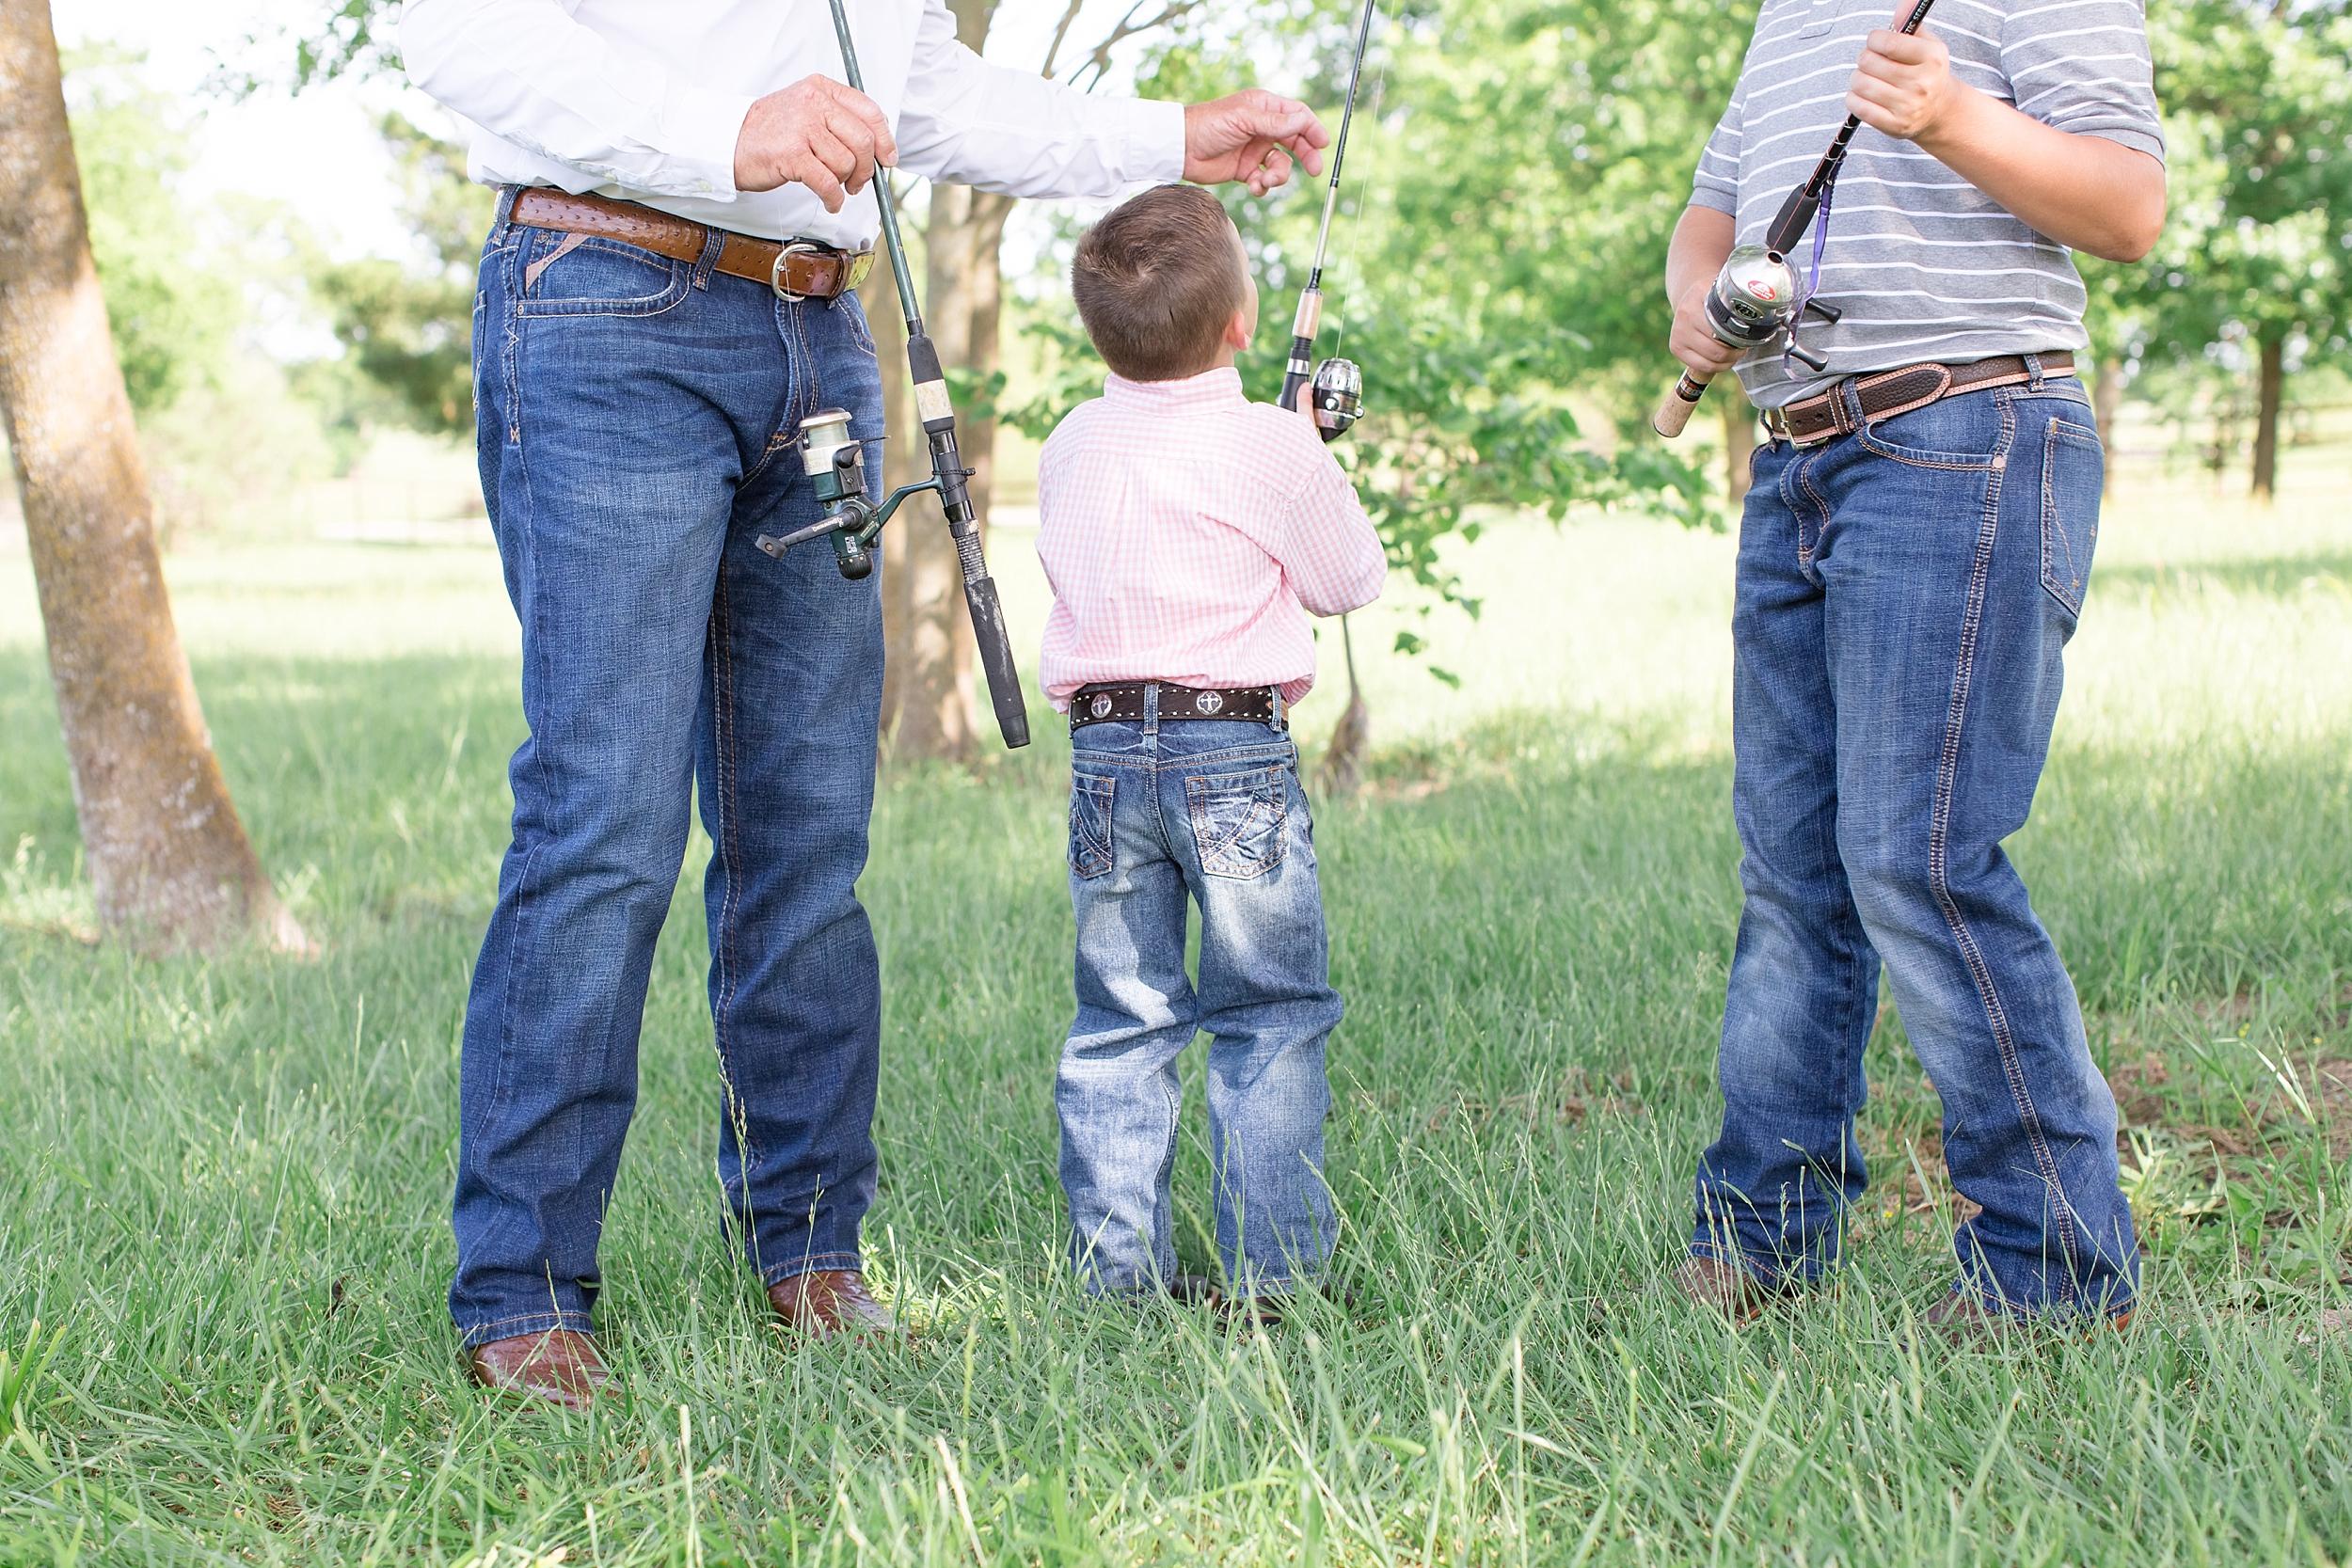 Landon-Schneider-Photography-Family-Session-Texas_0010.jpg